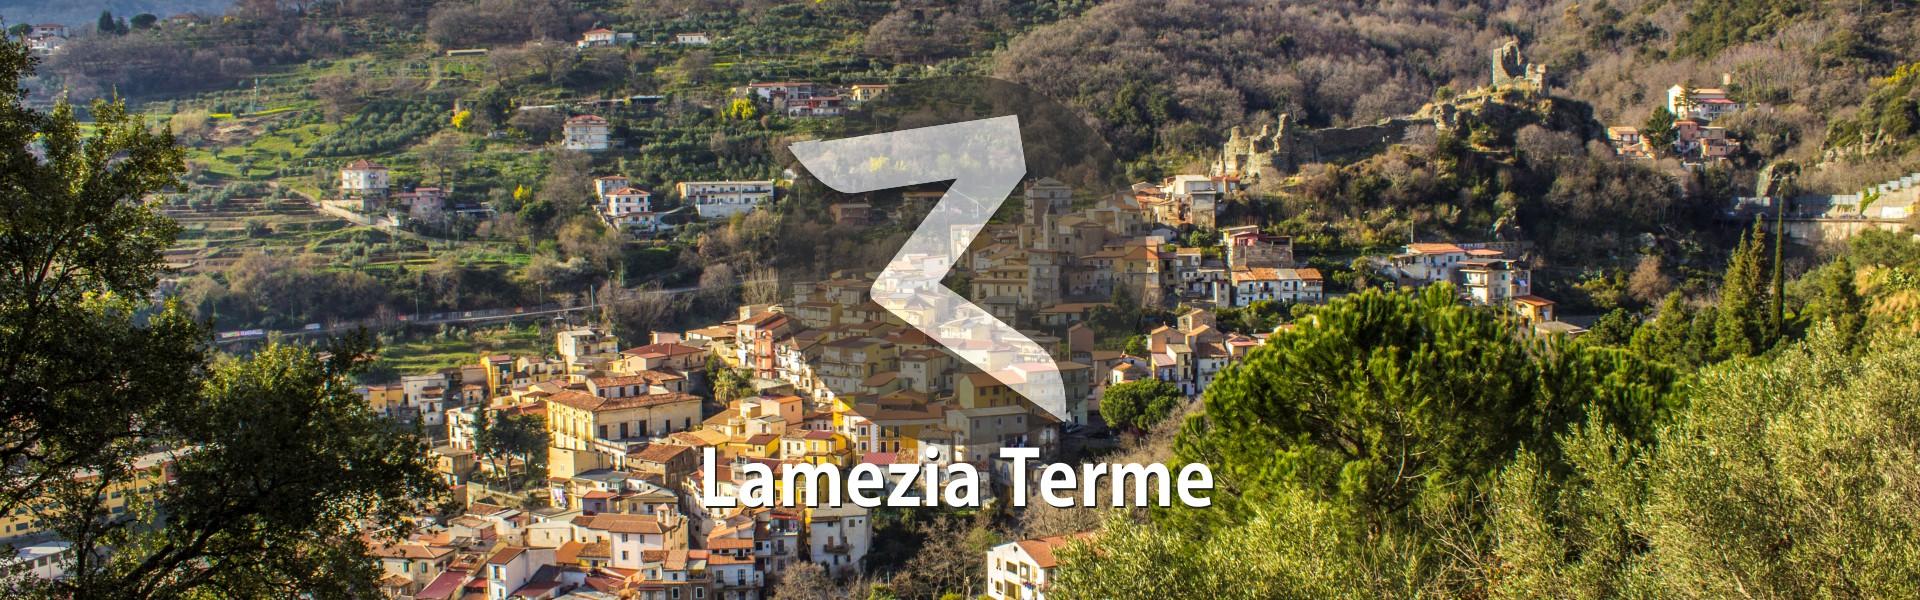 Web marketing zone Lamezia Terme